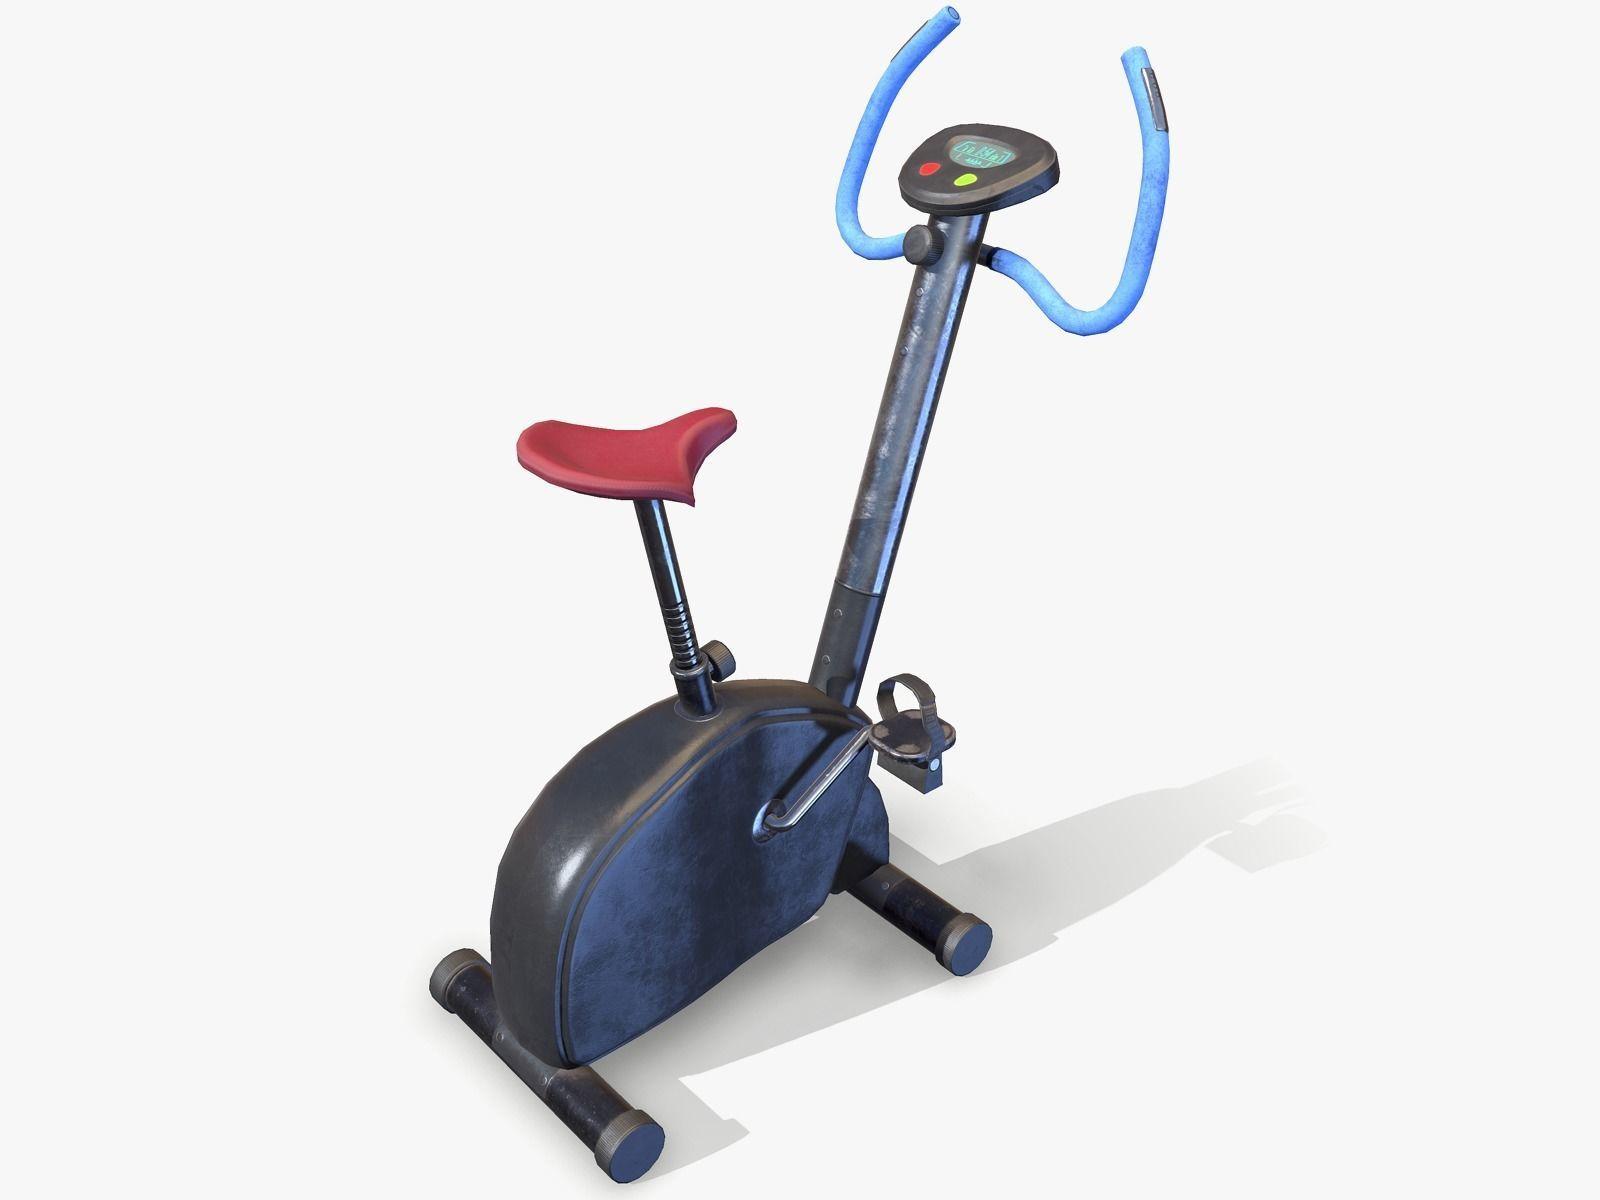 Workout Bike lowpoly